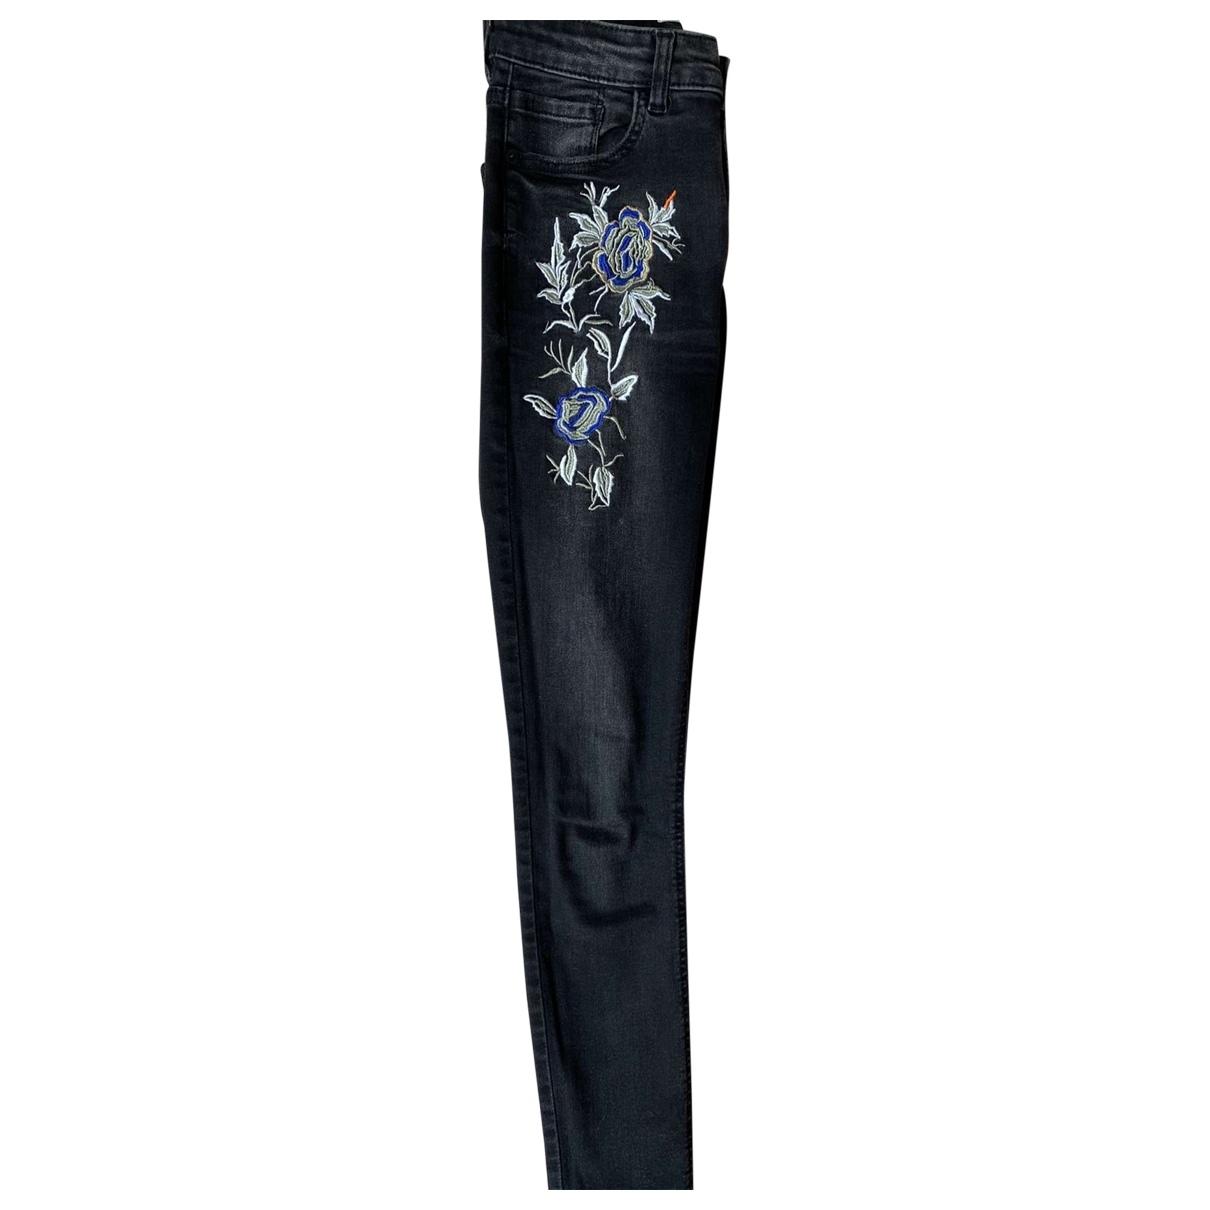 Mango \N Black Denim - Jeans Jeans for Women 34 FR